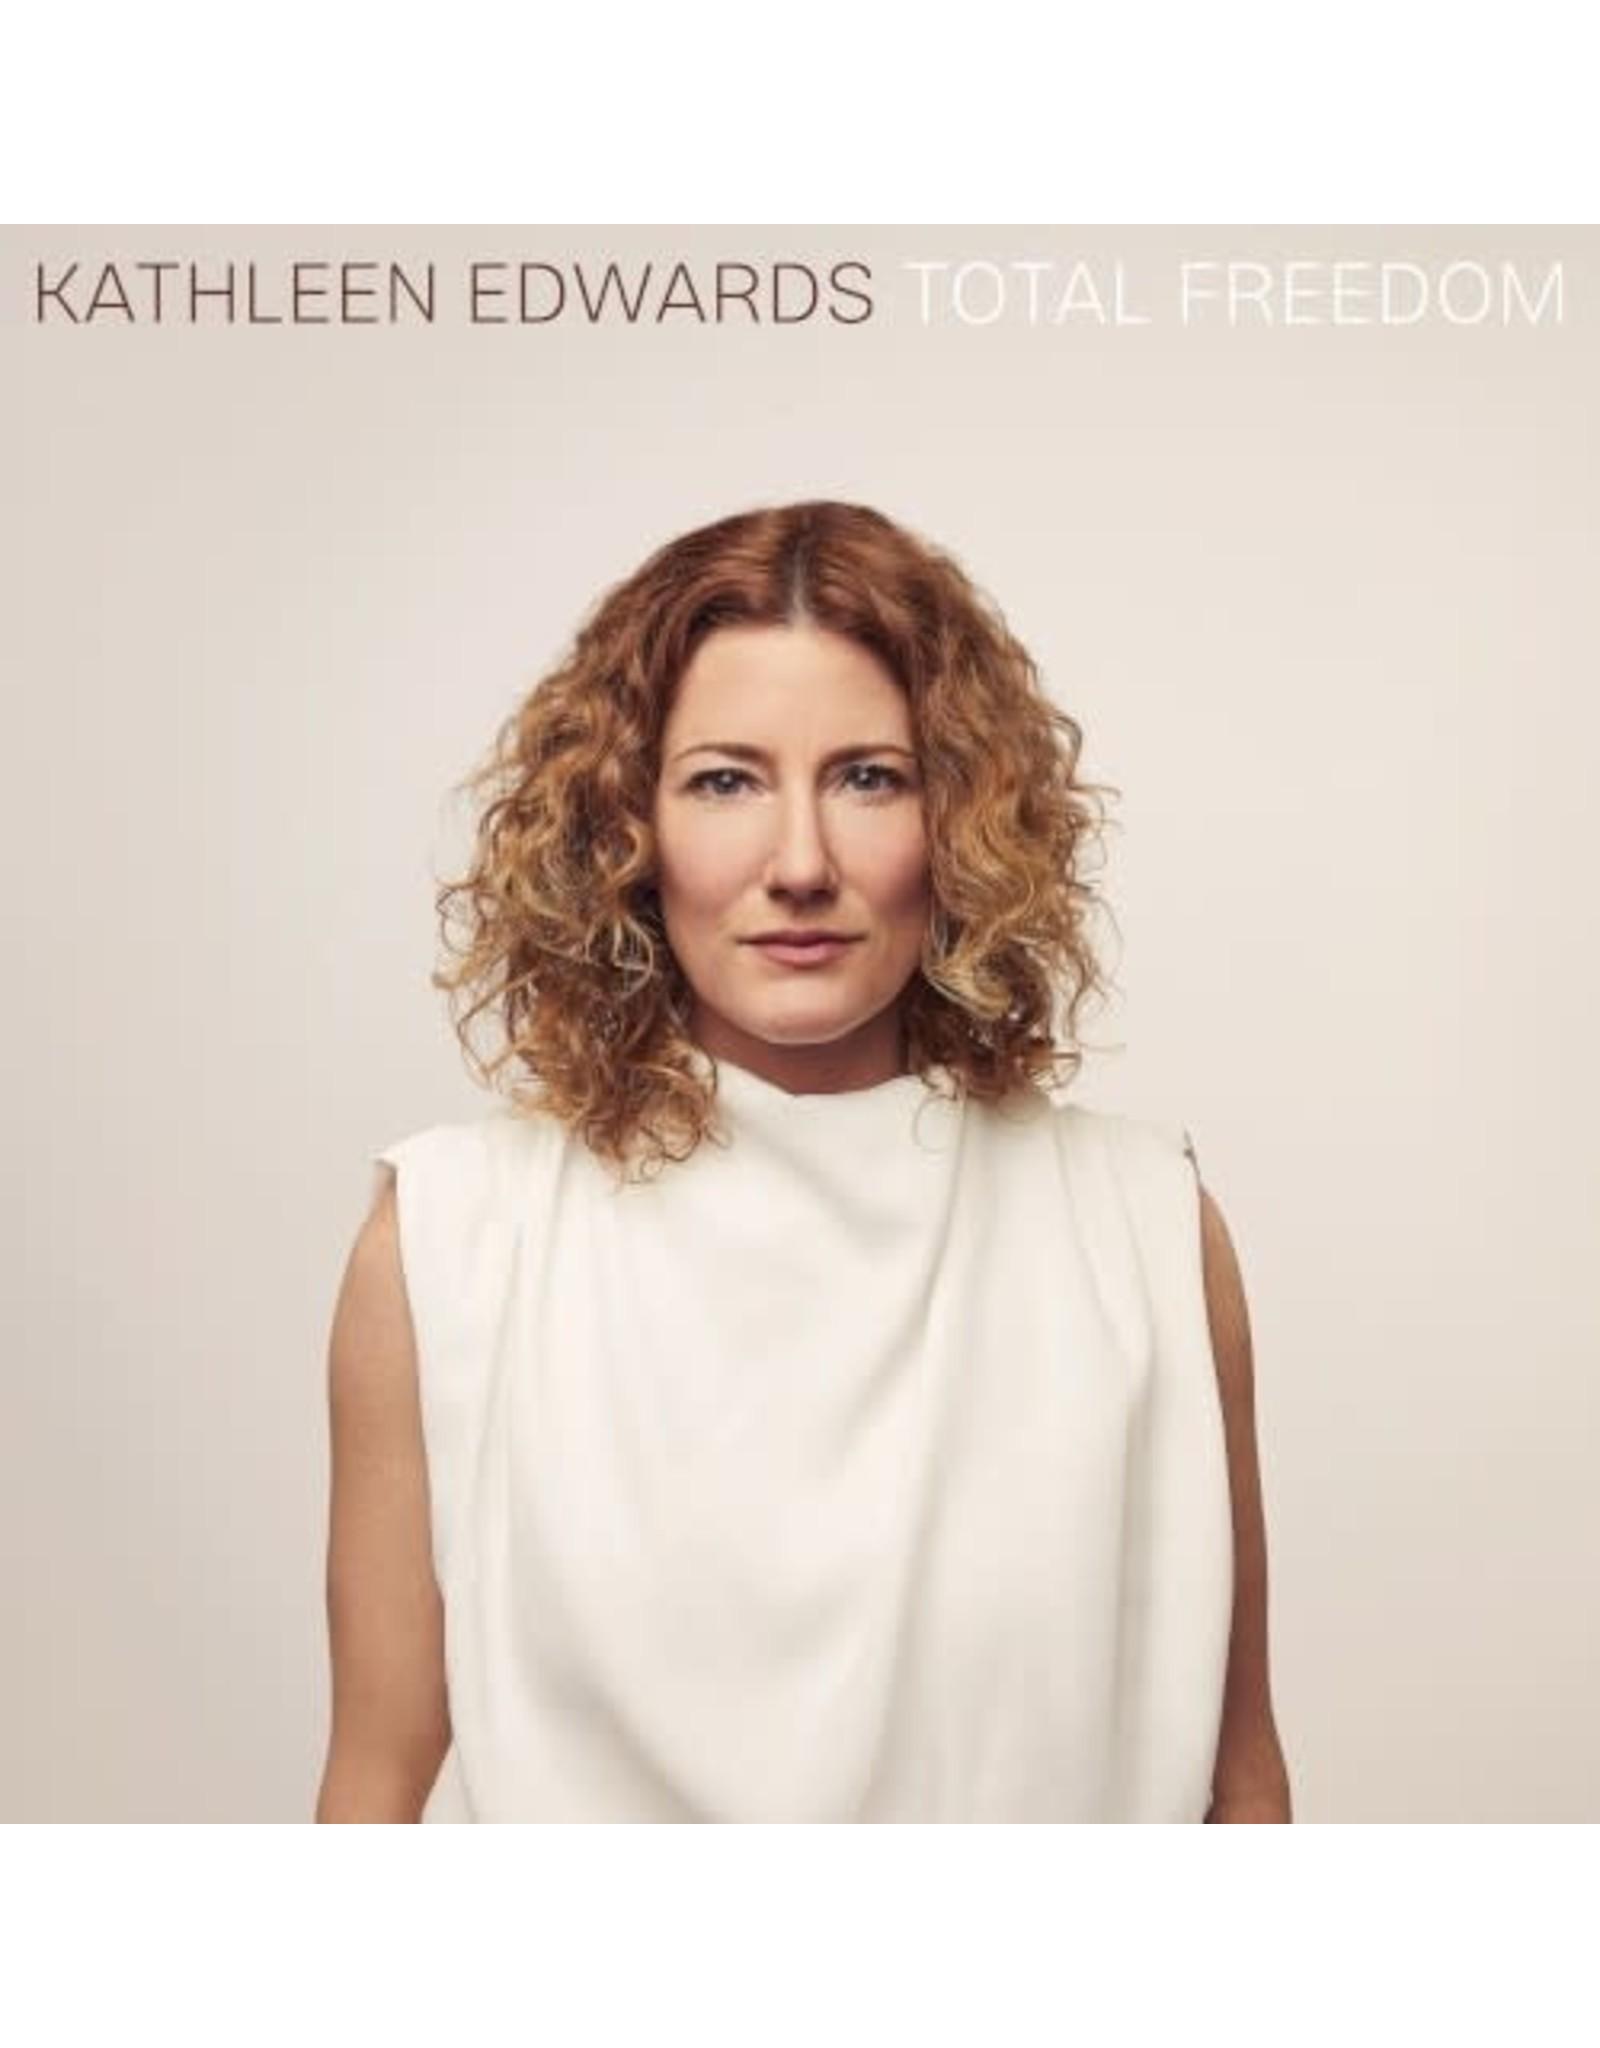 Edwards, Kathleen - Total Freedom LP